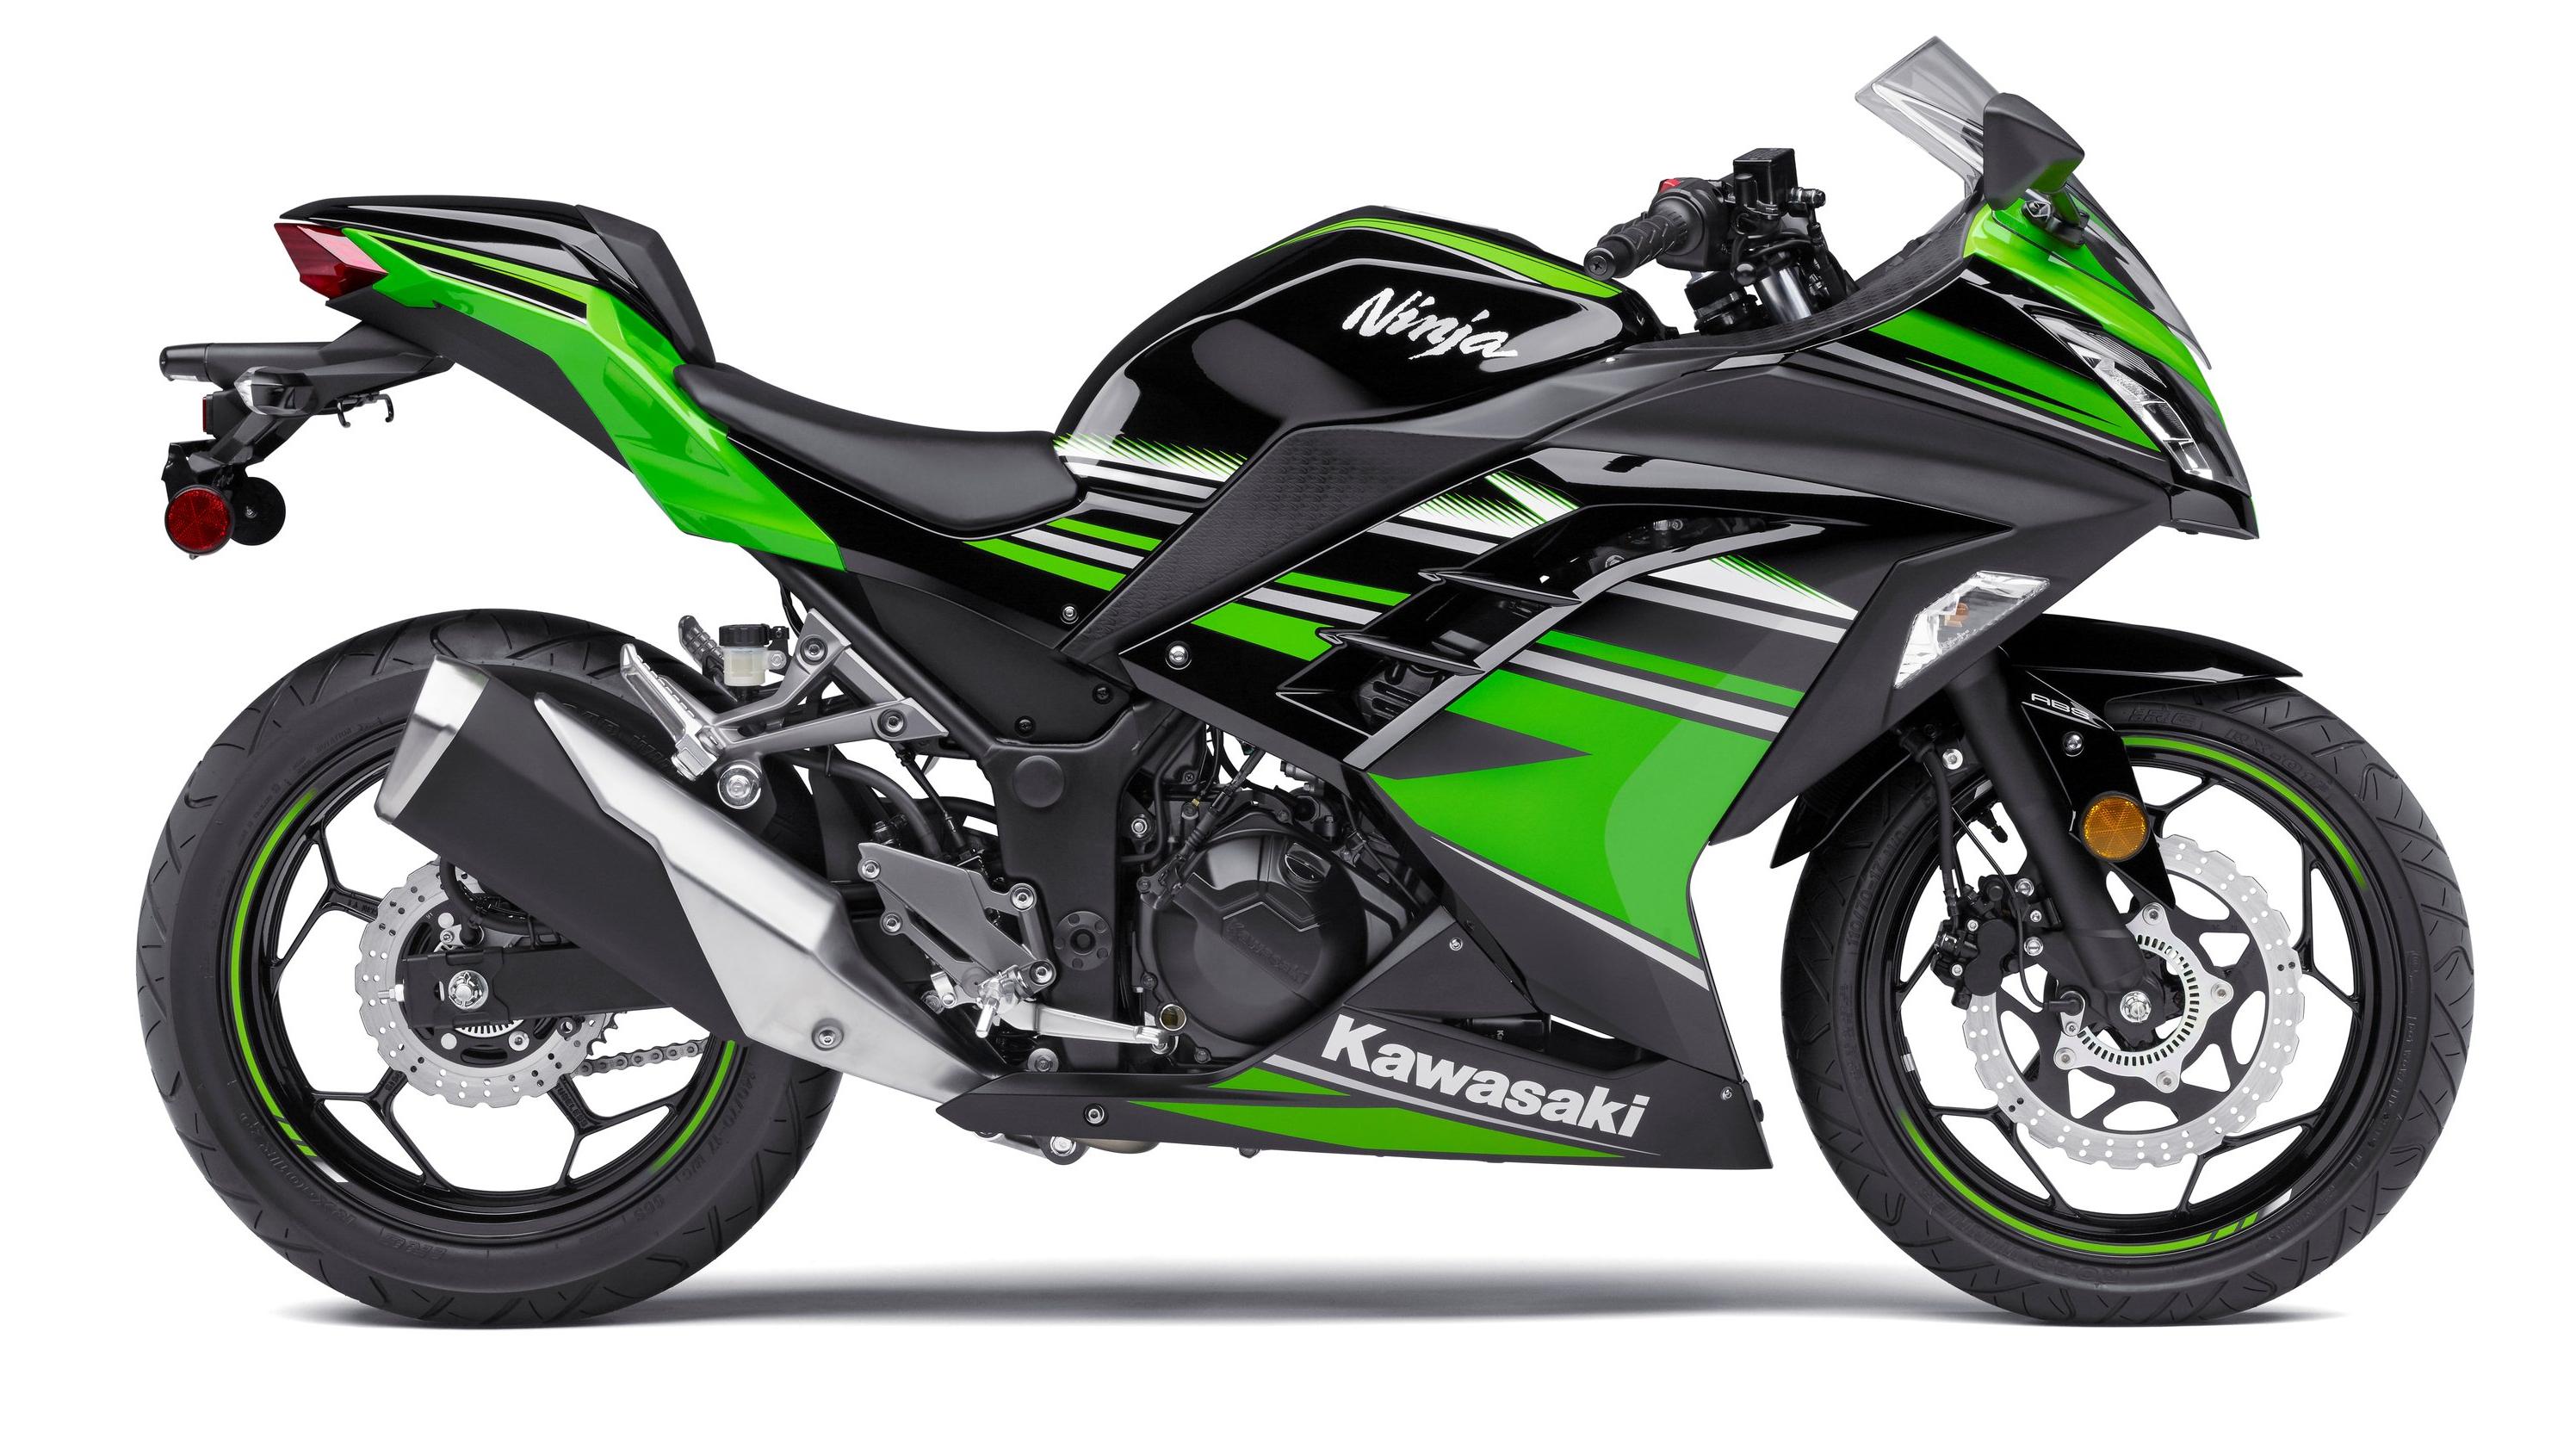 Kawasaki Ninja 300 De 2017 Espírito De Competição Motores Sapo